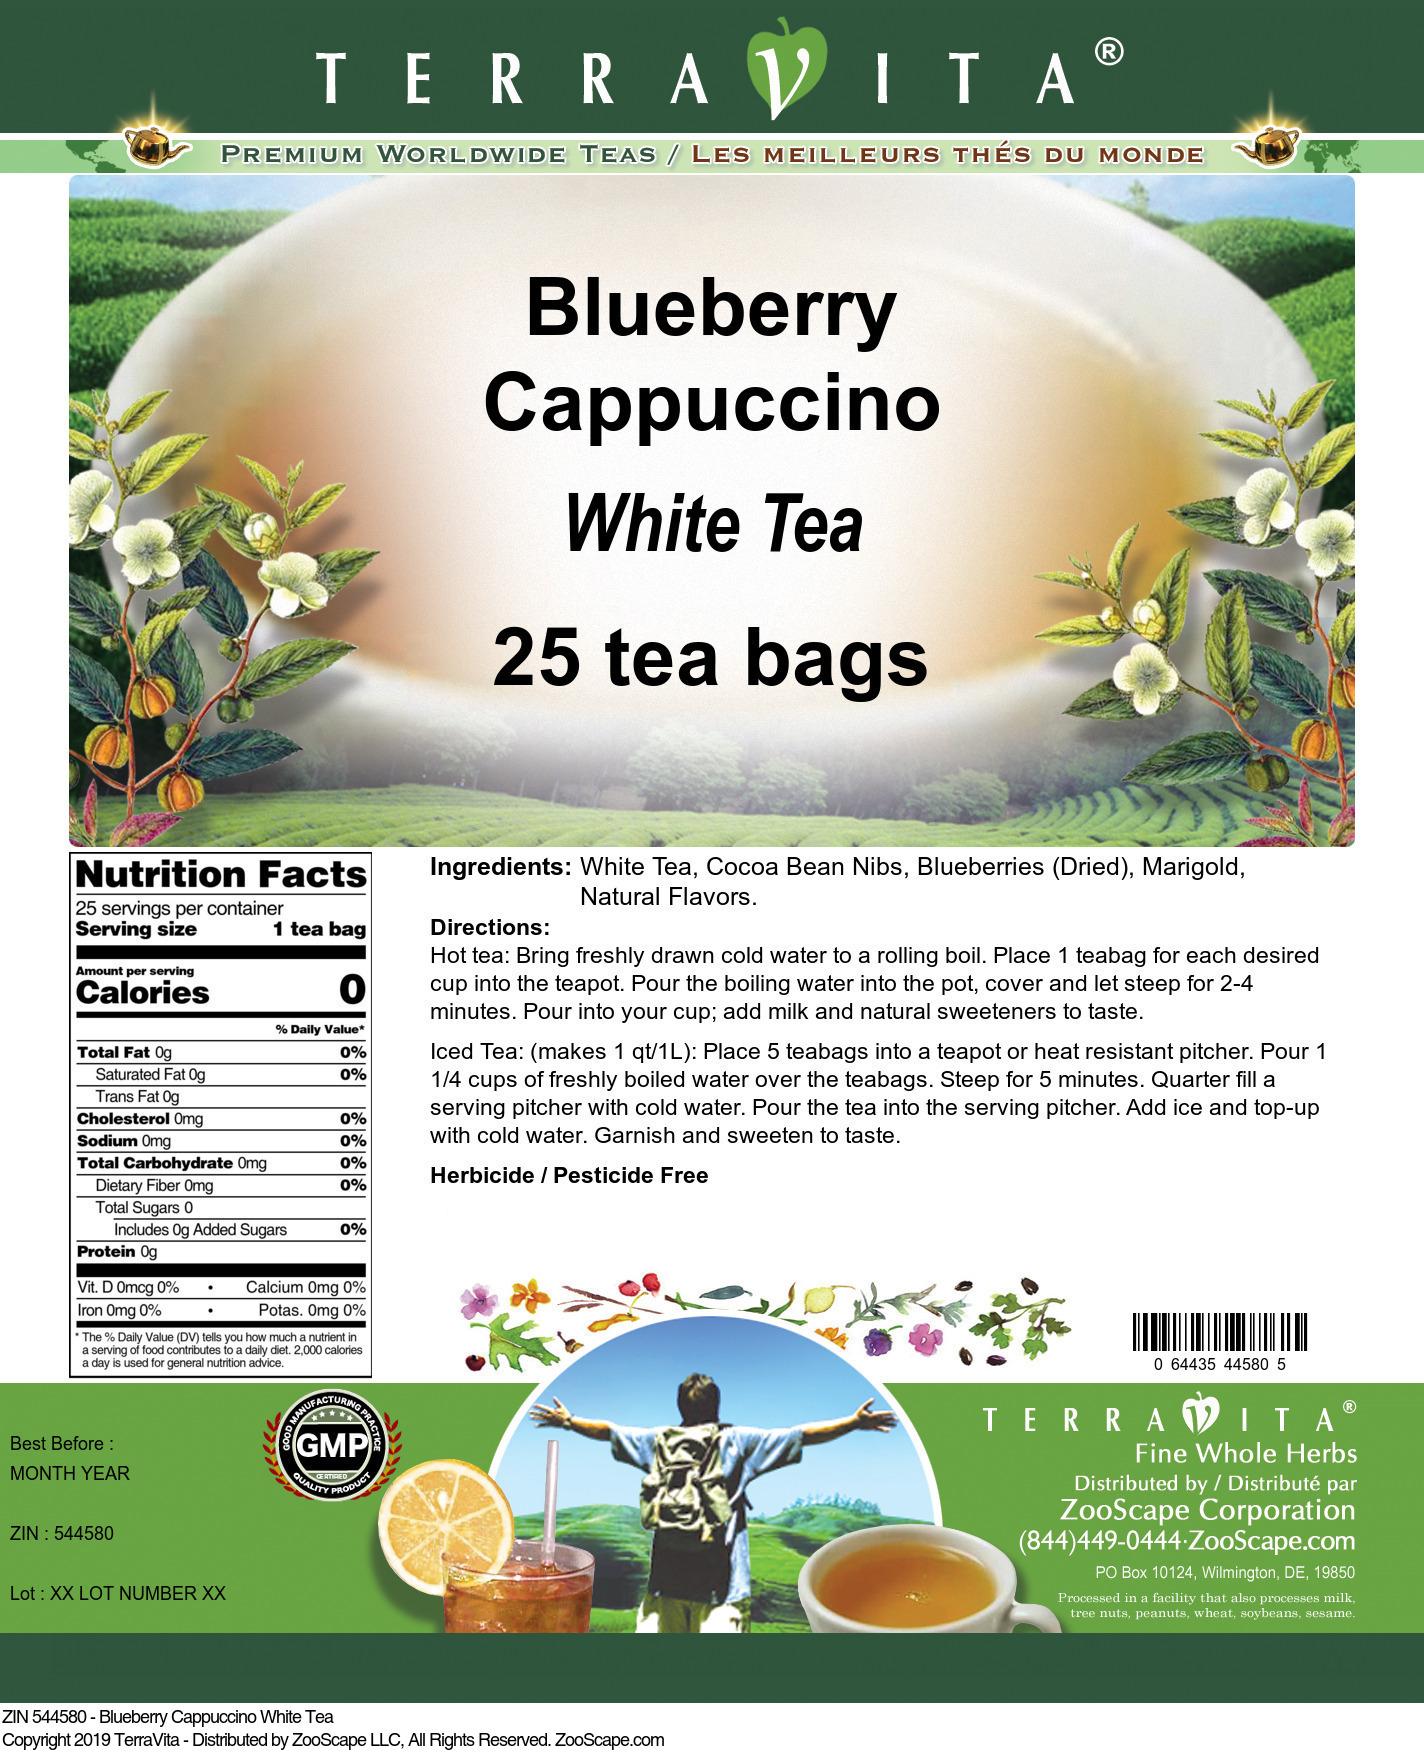 Blueberry Cappuccino White Tea